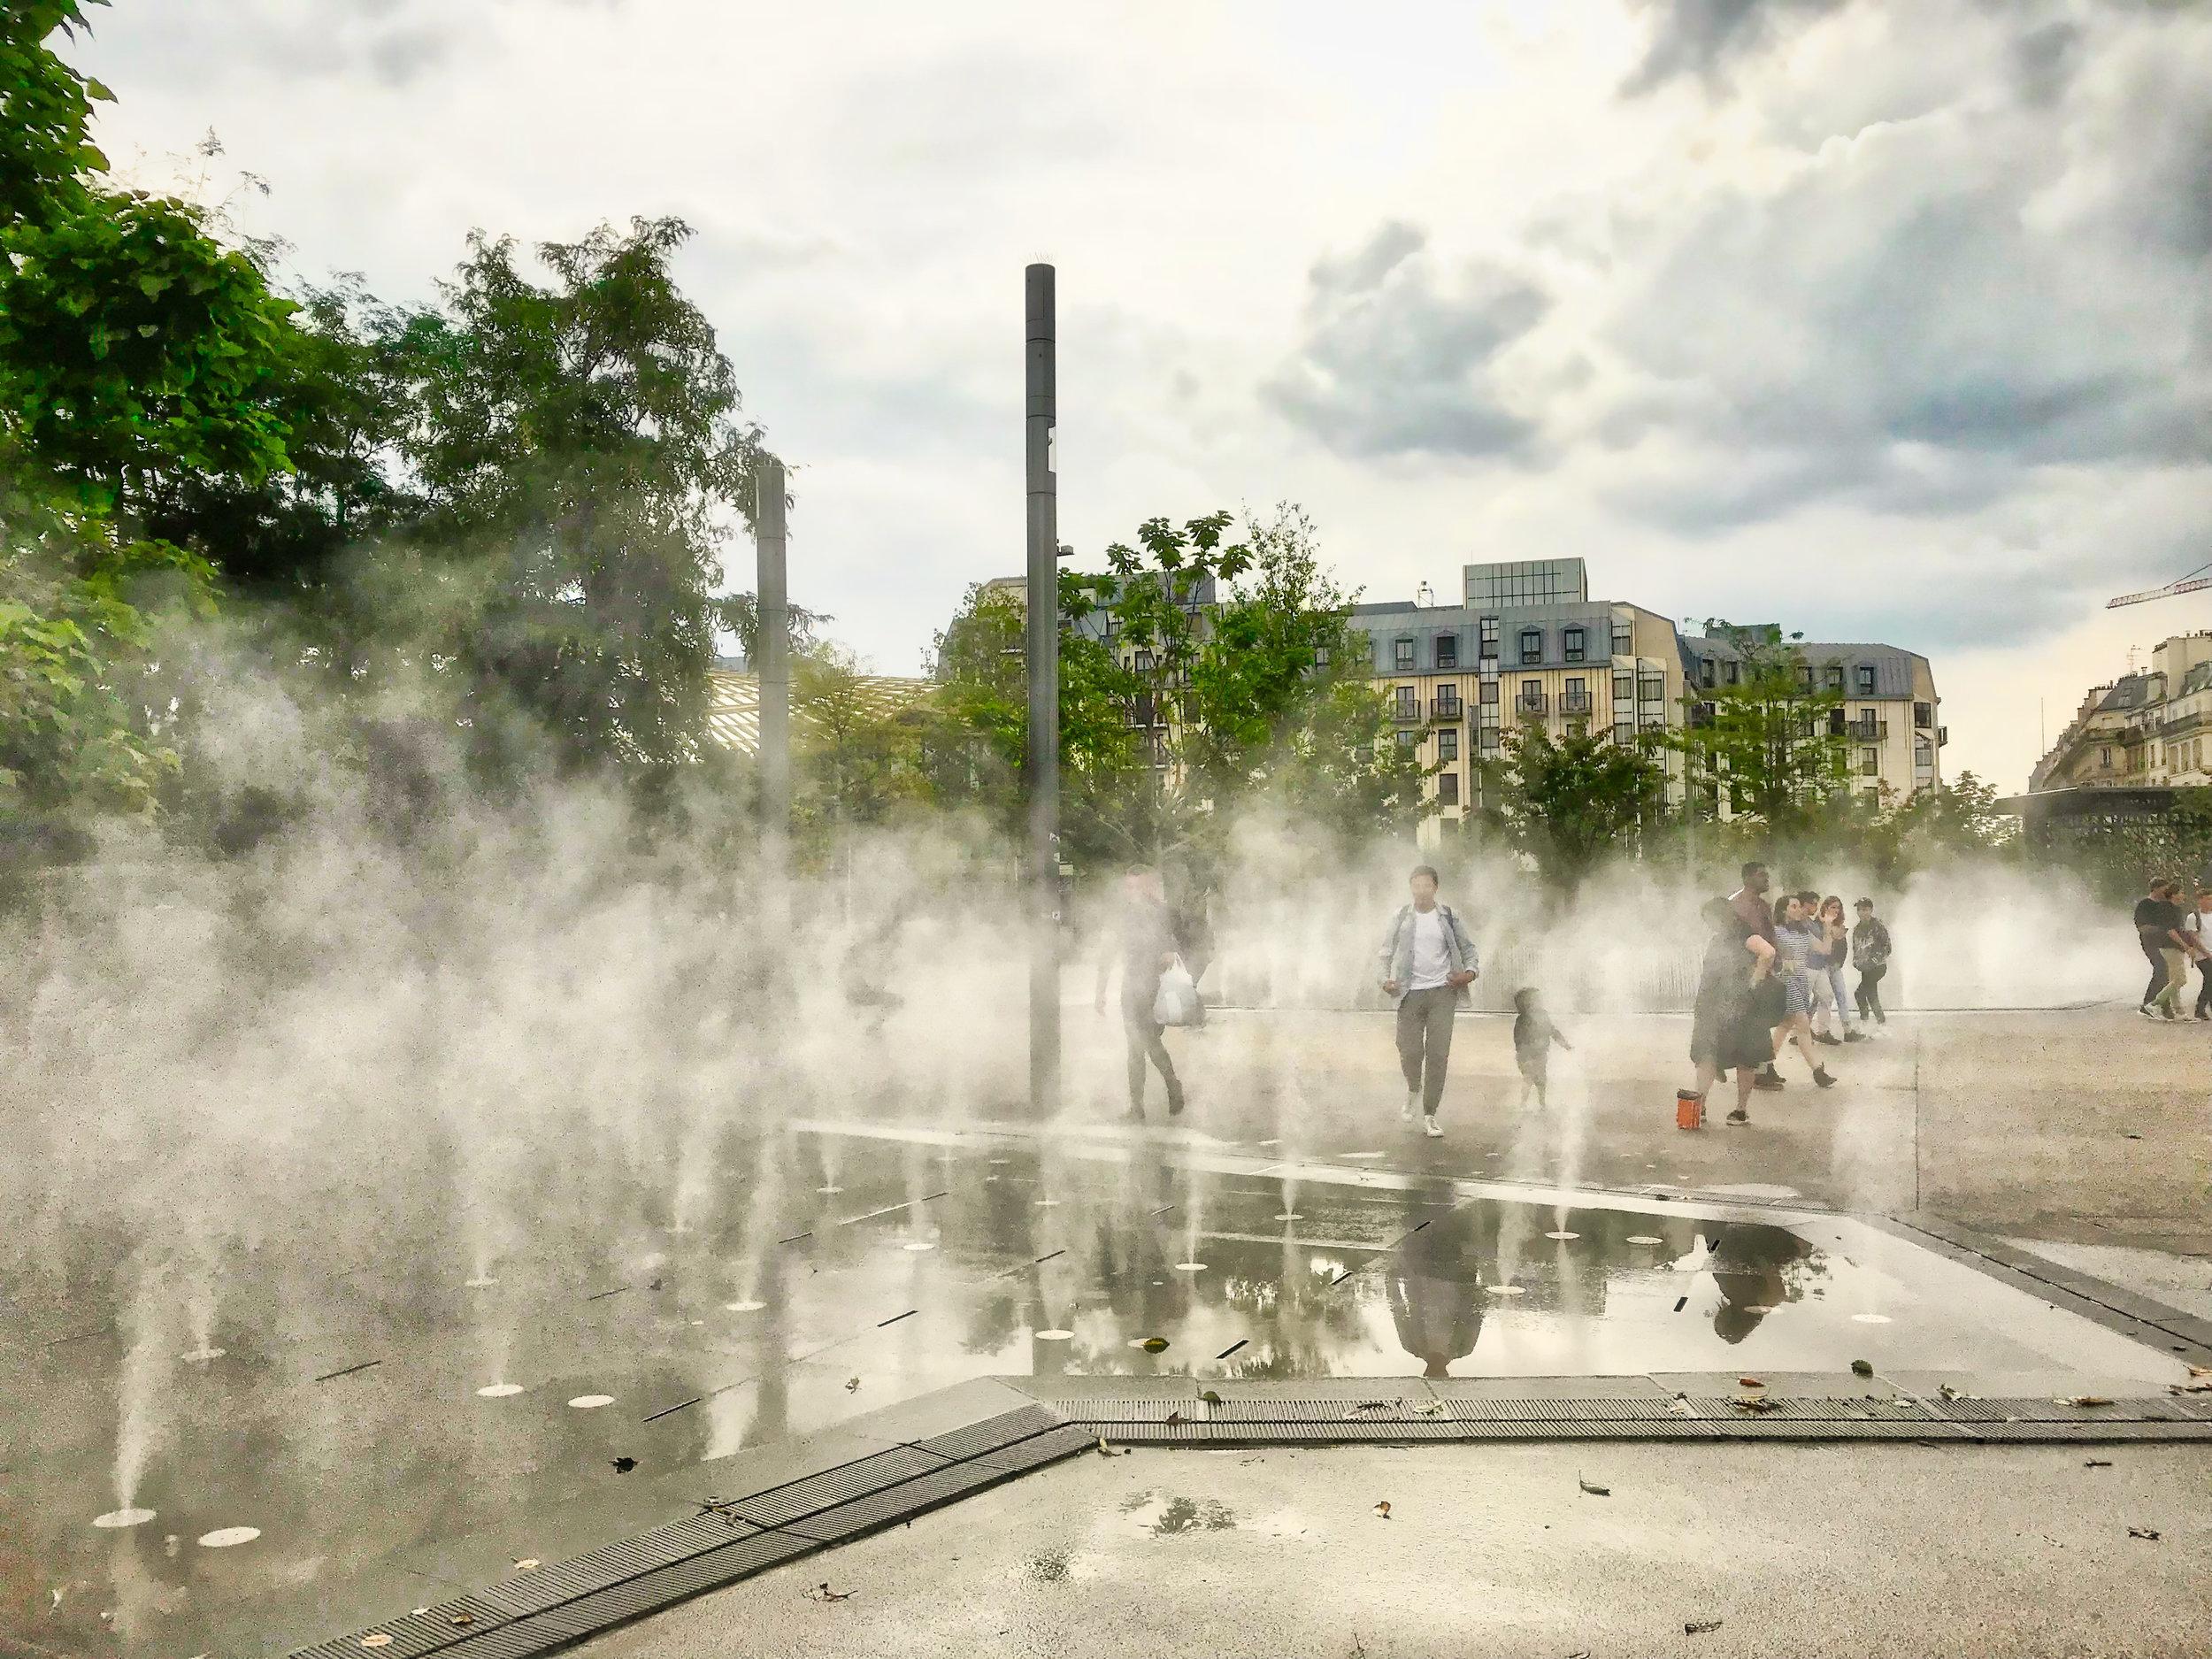 Steamy fountains